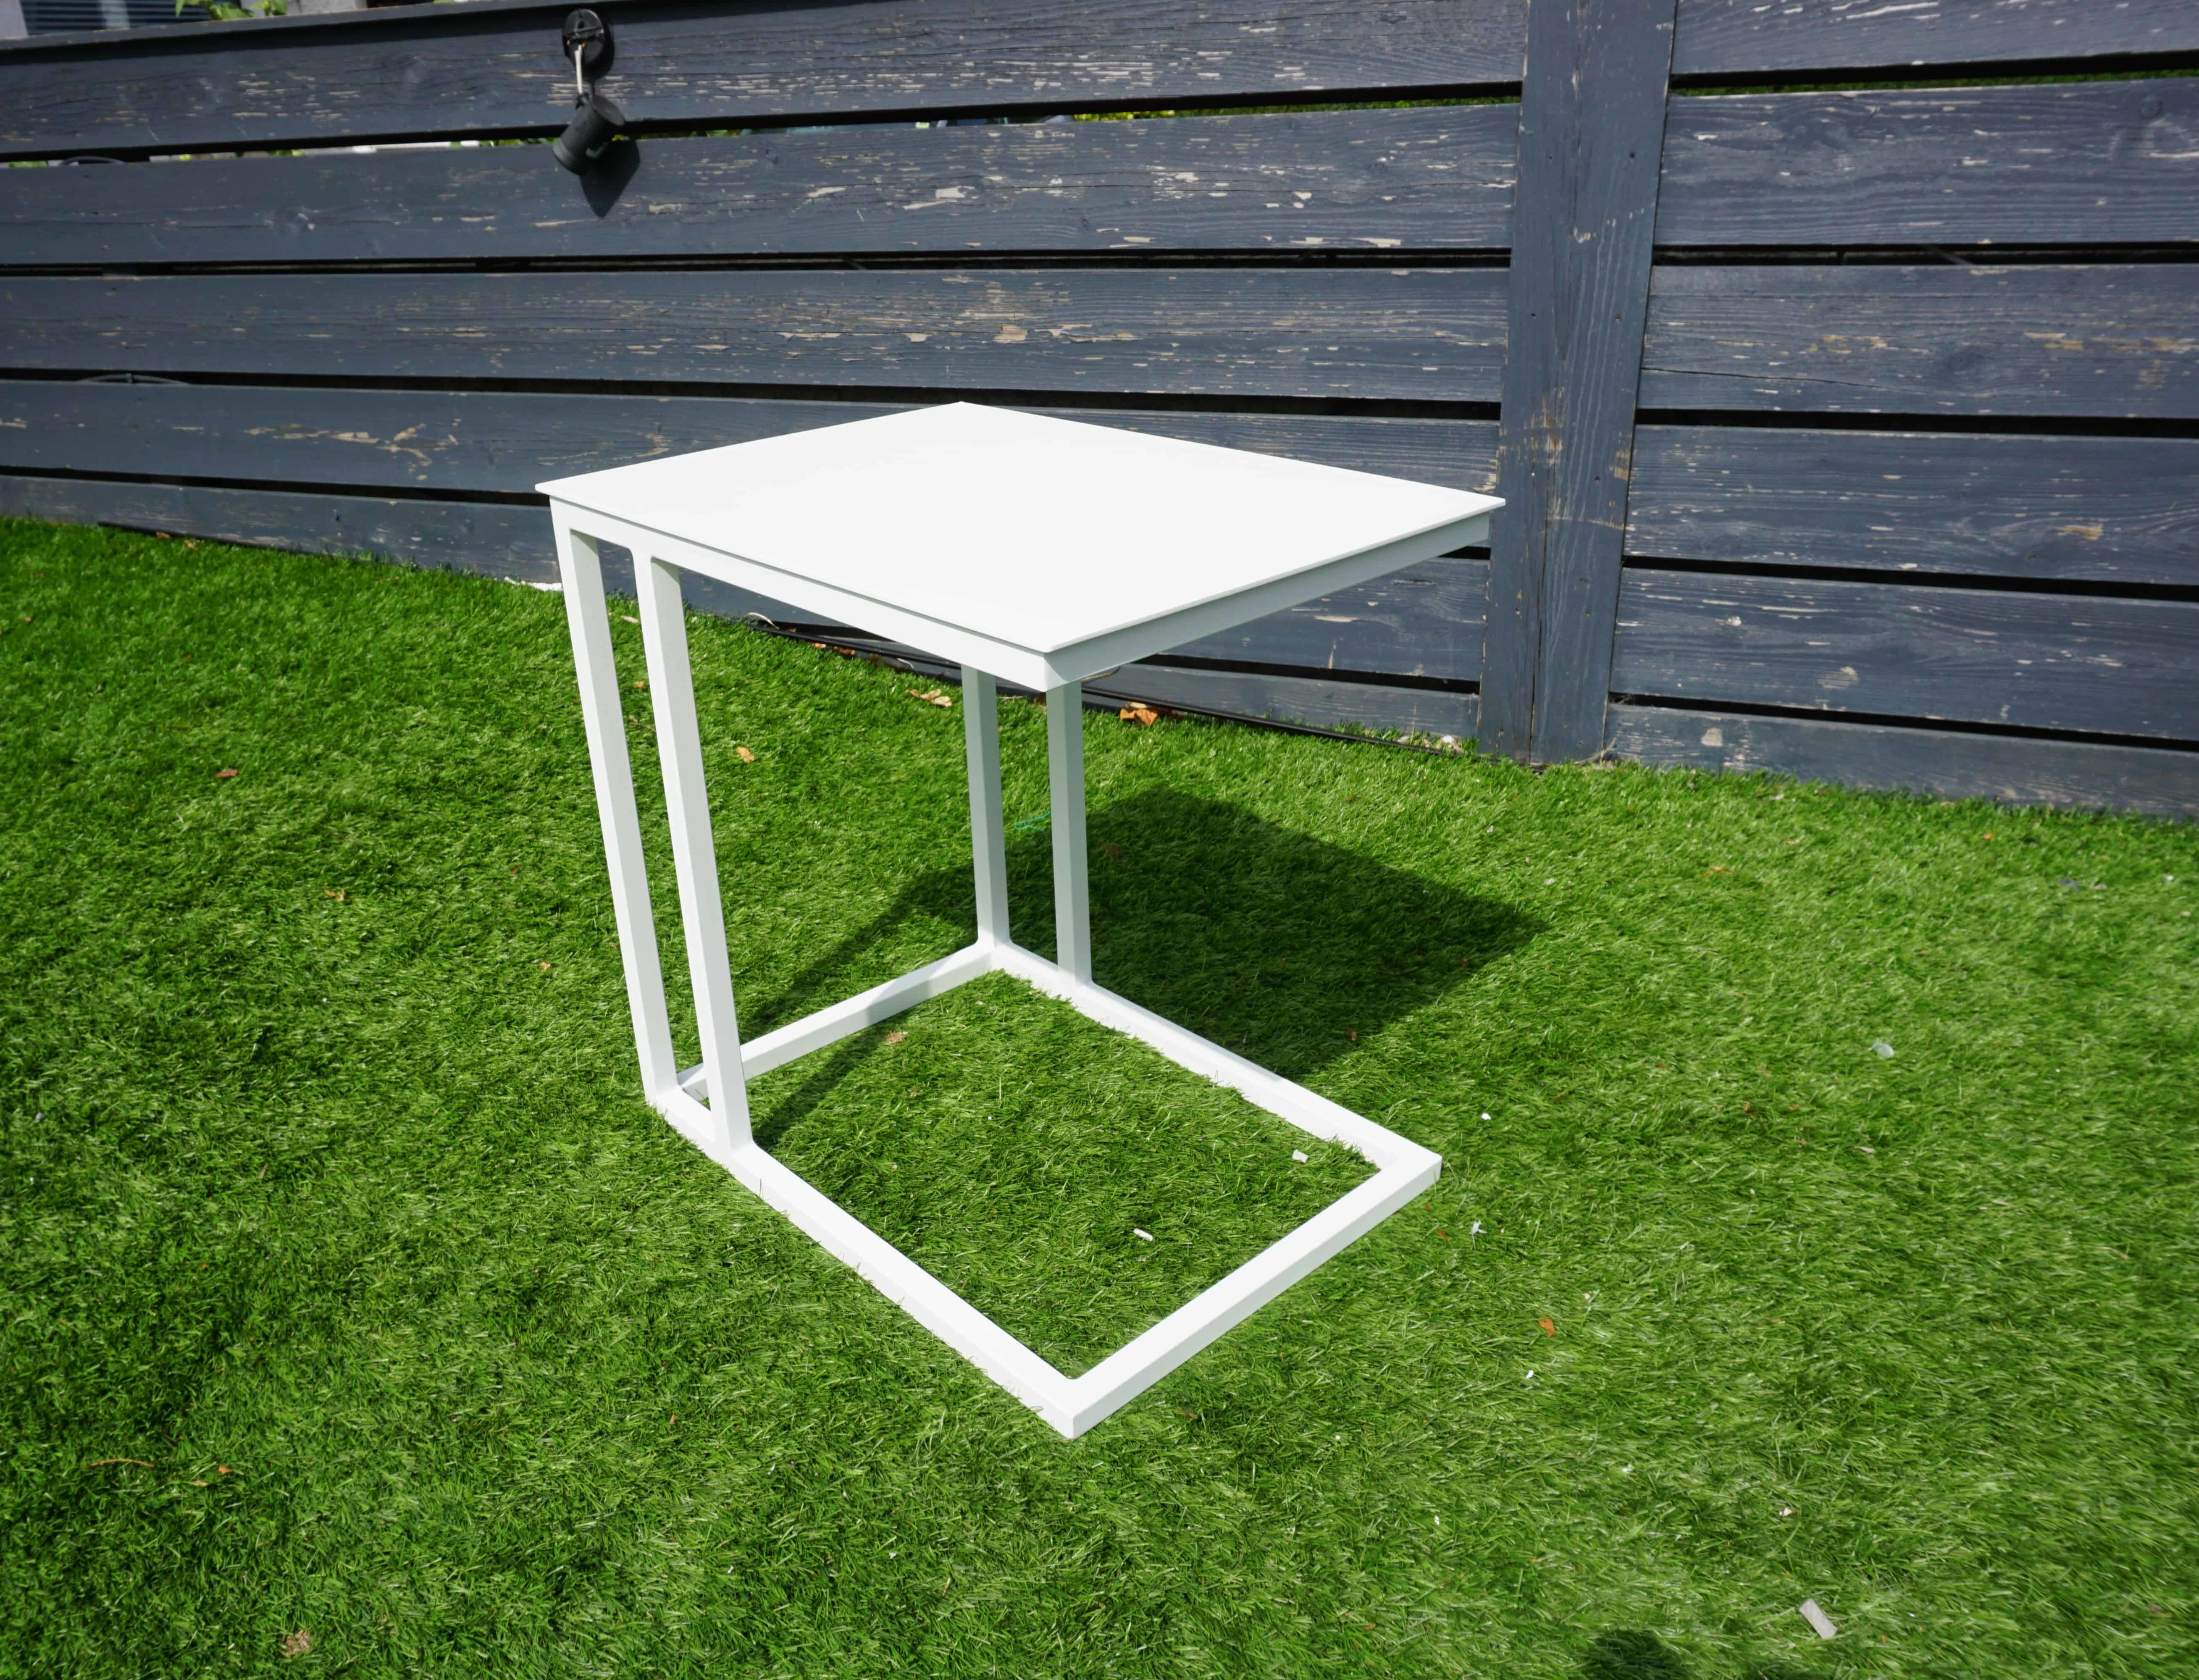 Grenada Alu Side Slide Coffe Table - Garden Furniture For Sale Dublin Ireland